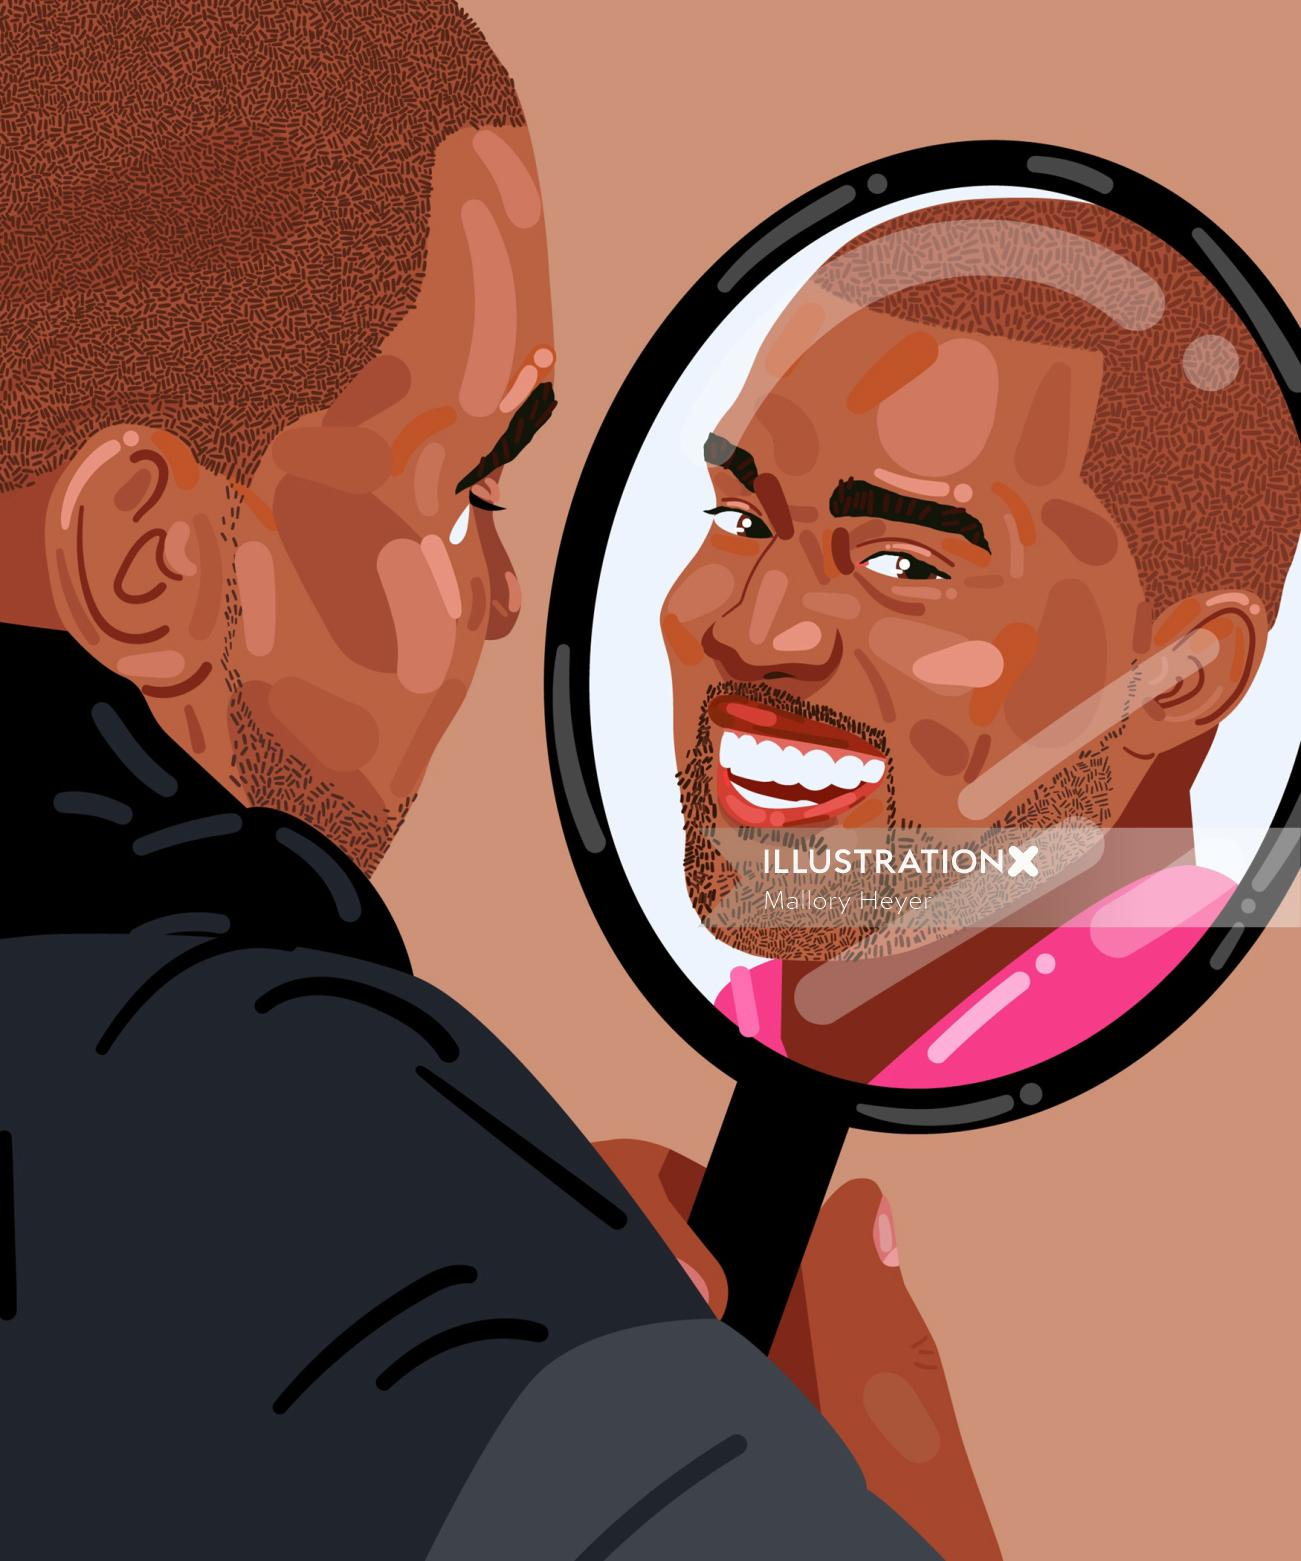 Kanye West portrait illustration by Mallory Heyer